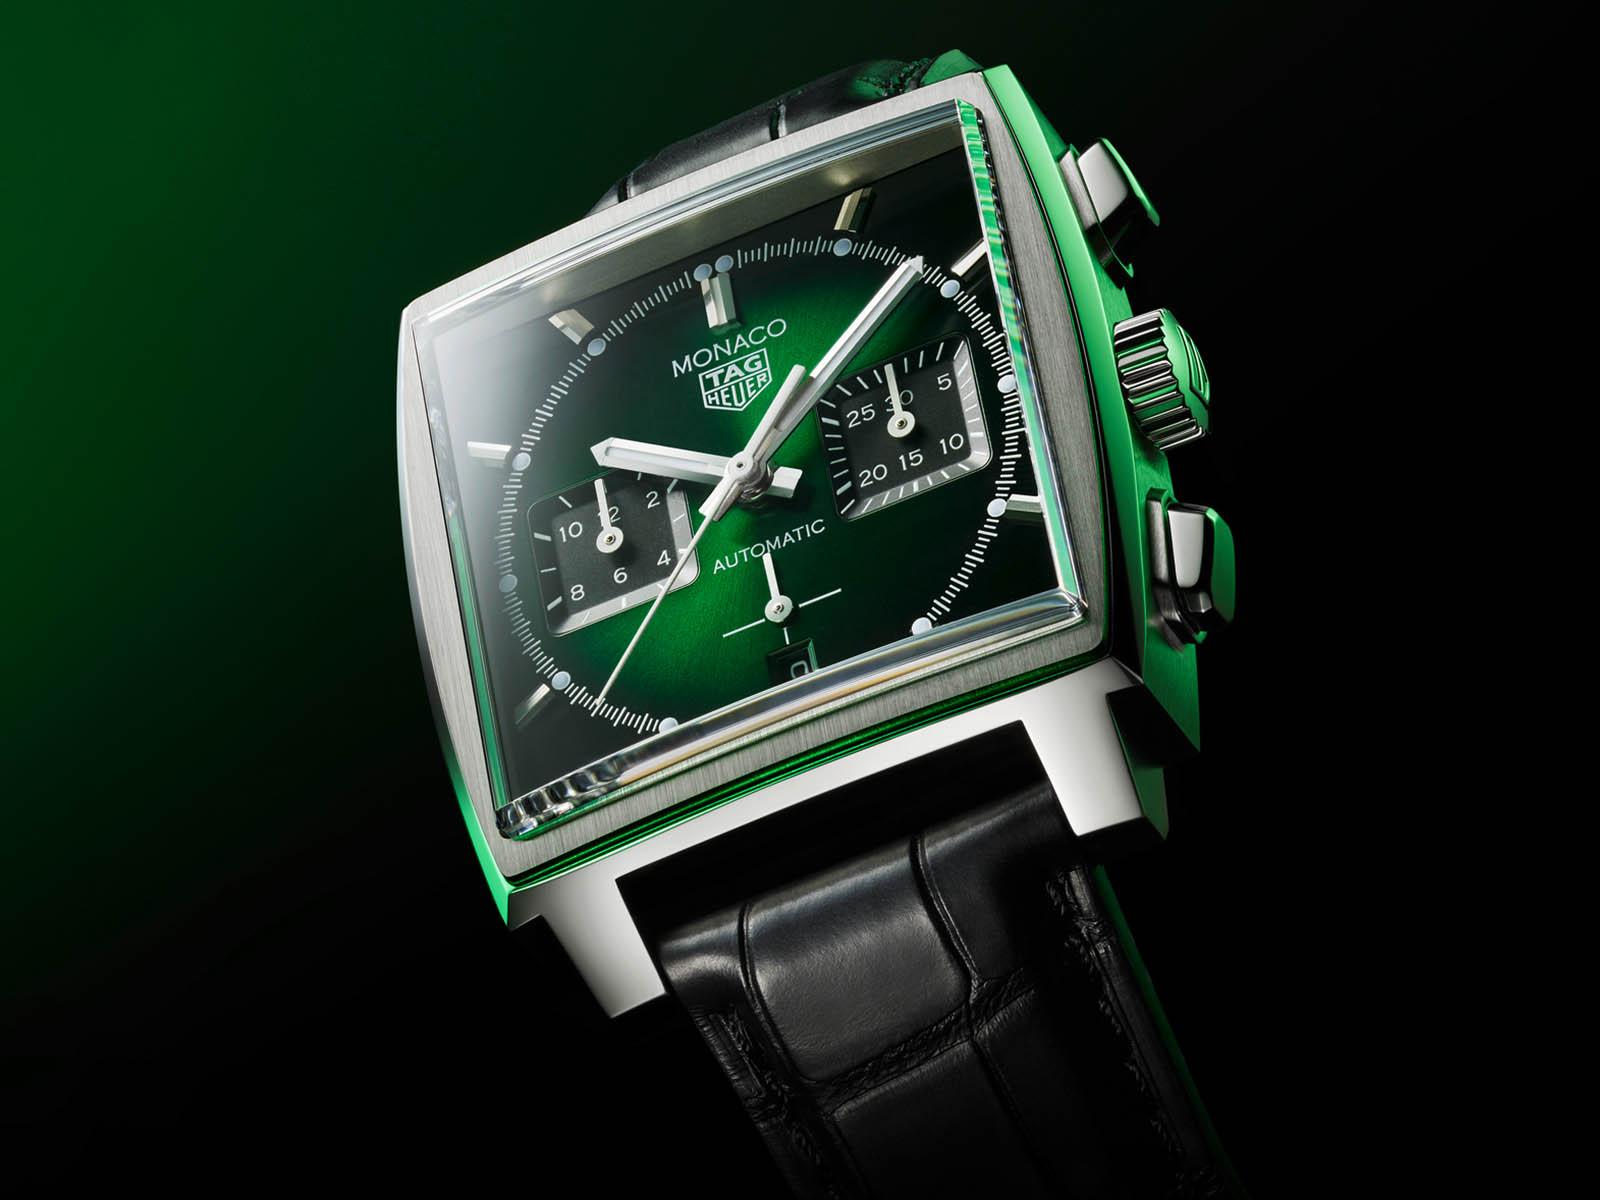 cbl2116-fc6497-tag-heuer-monaco-green-dial-calibre-heuer-02-limited-edition-3.jpg